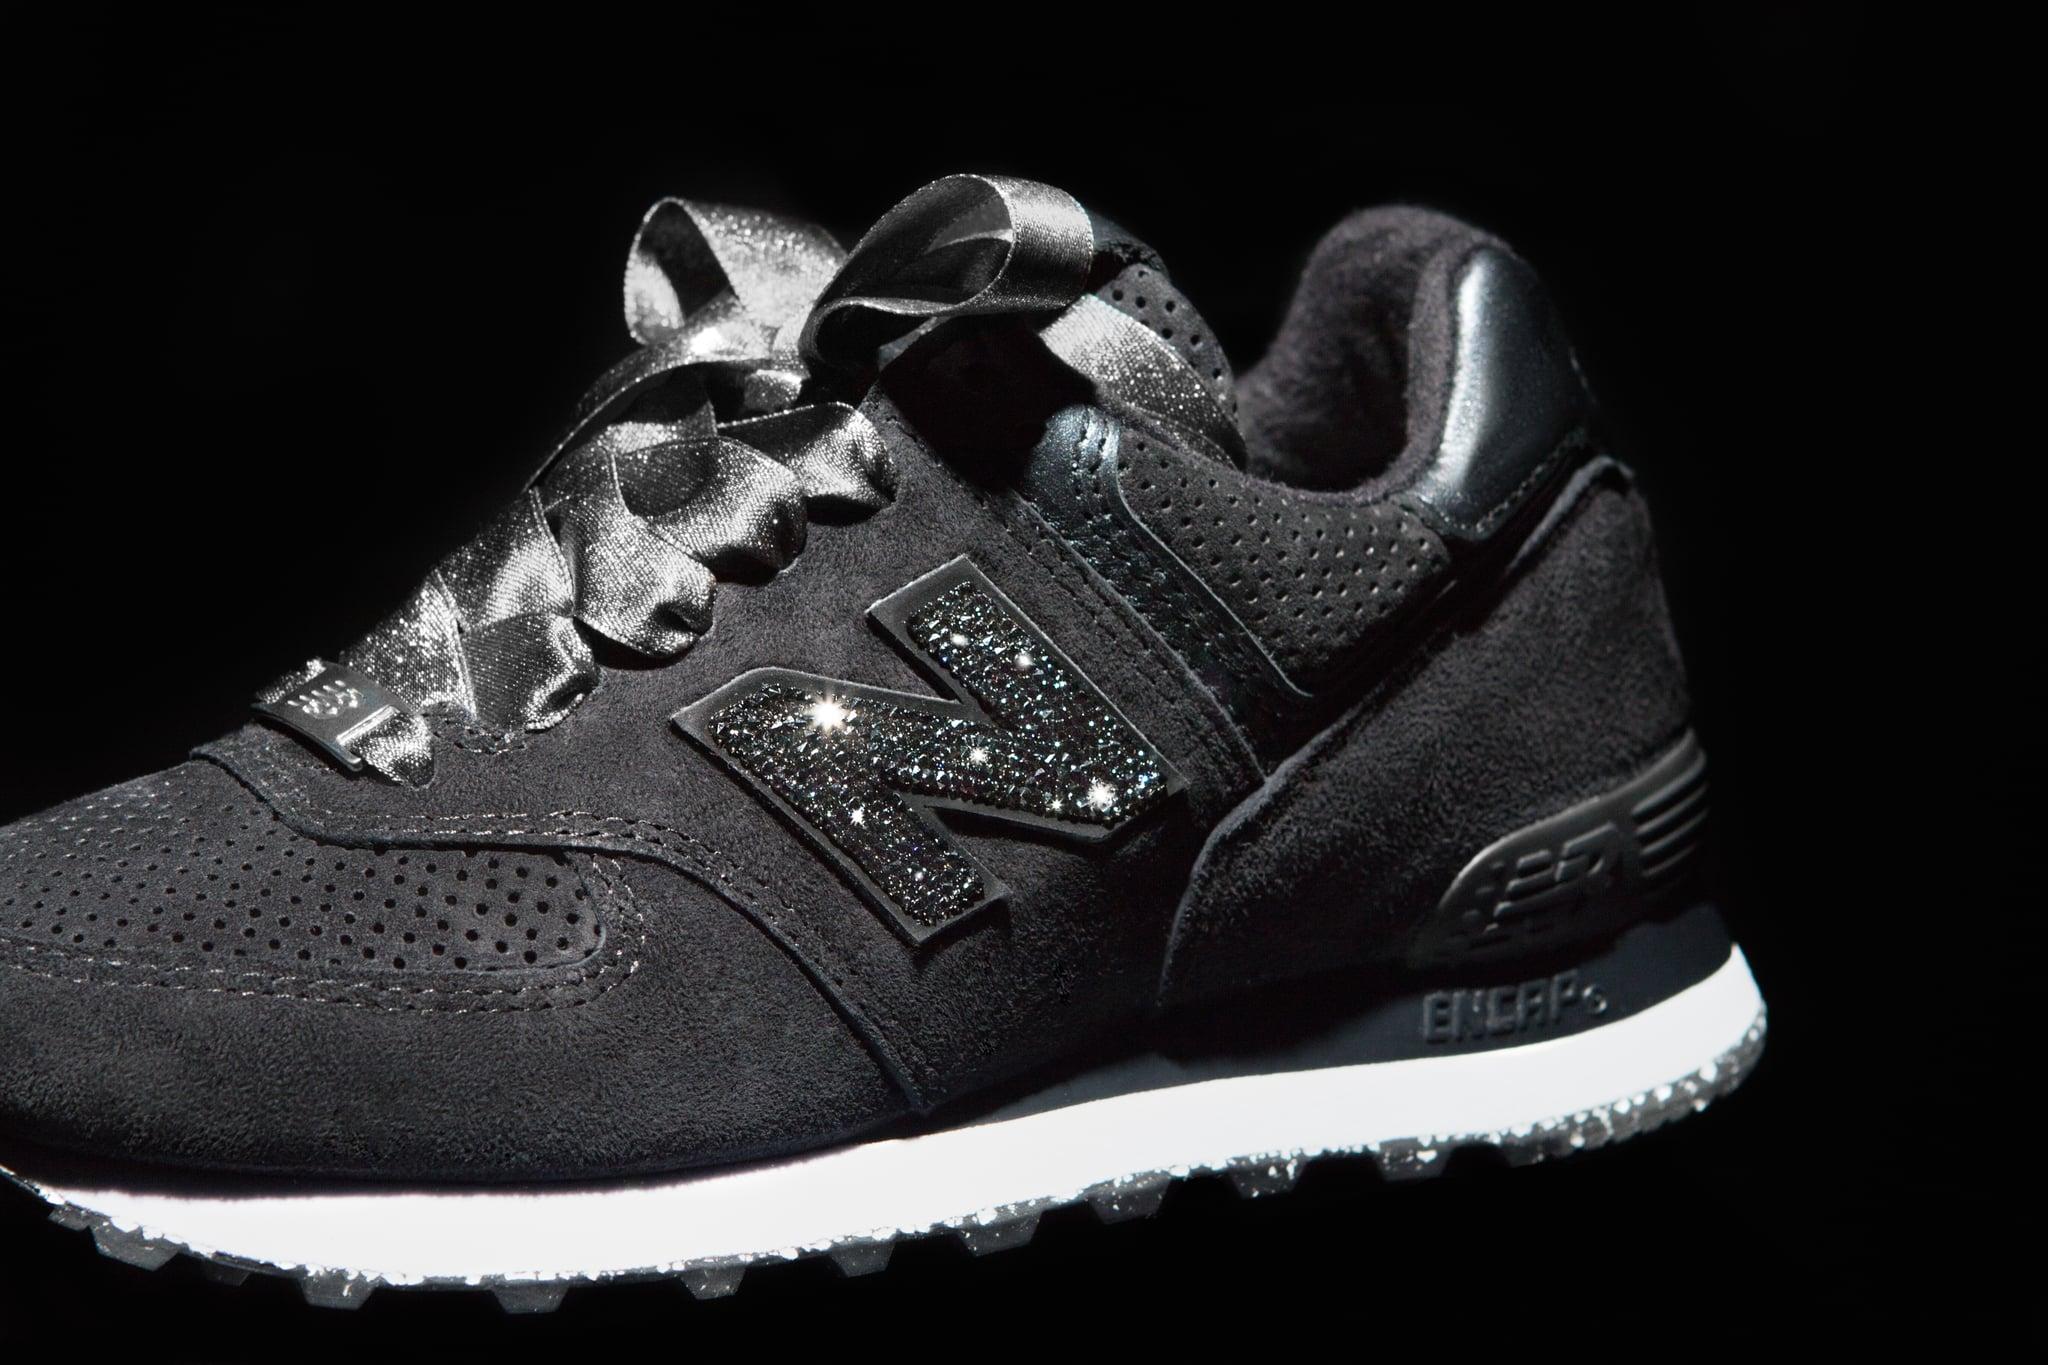 New Balance Swarovski Crystal Sneakers | POPSUGAR Fashion